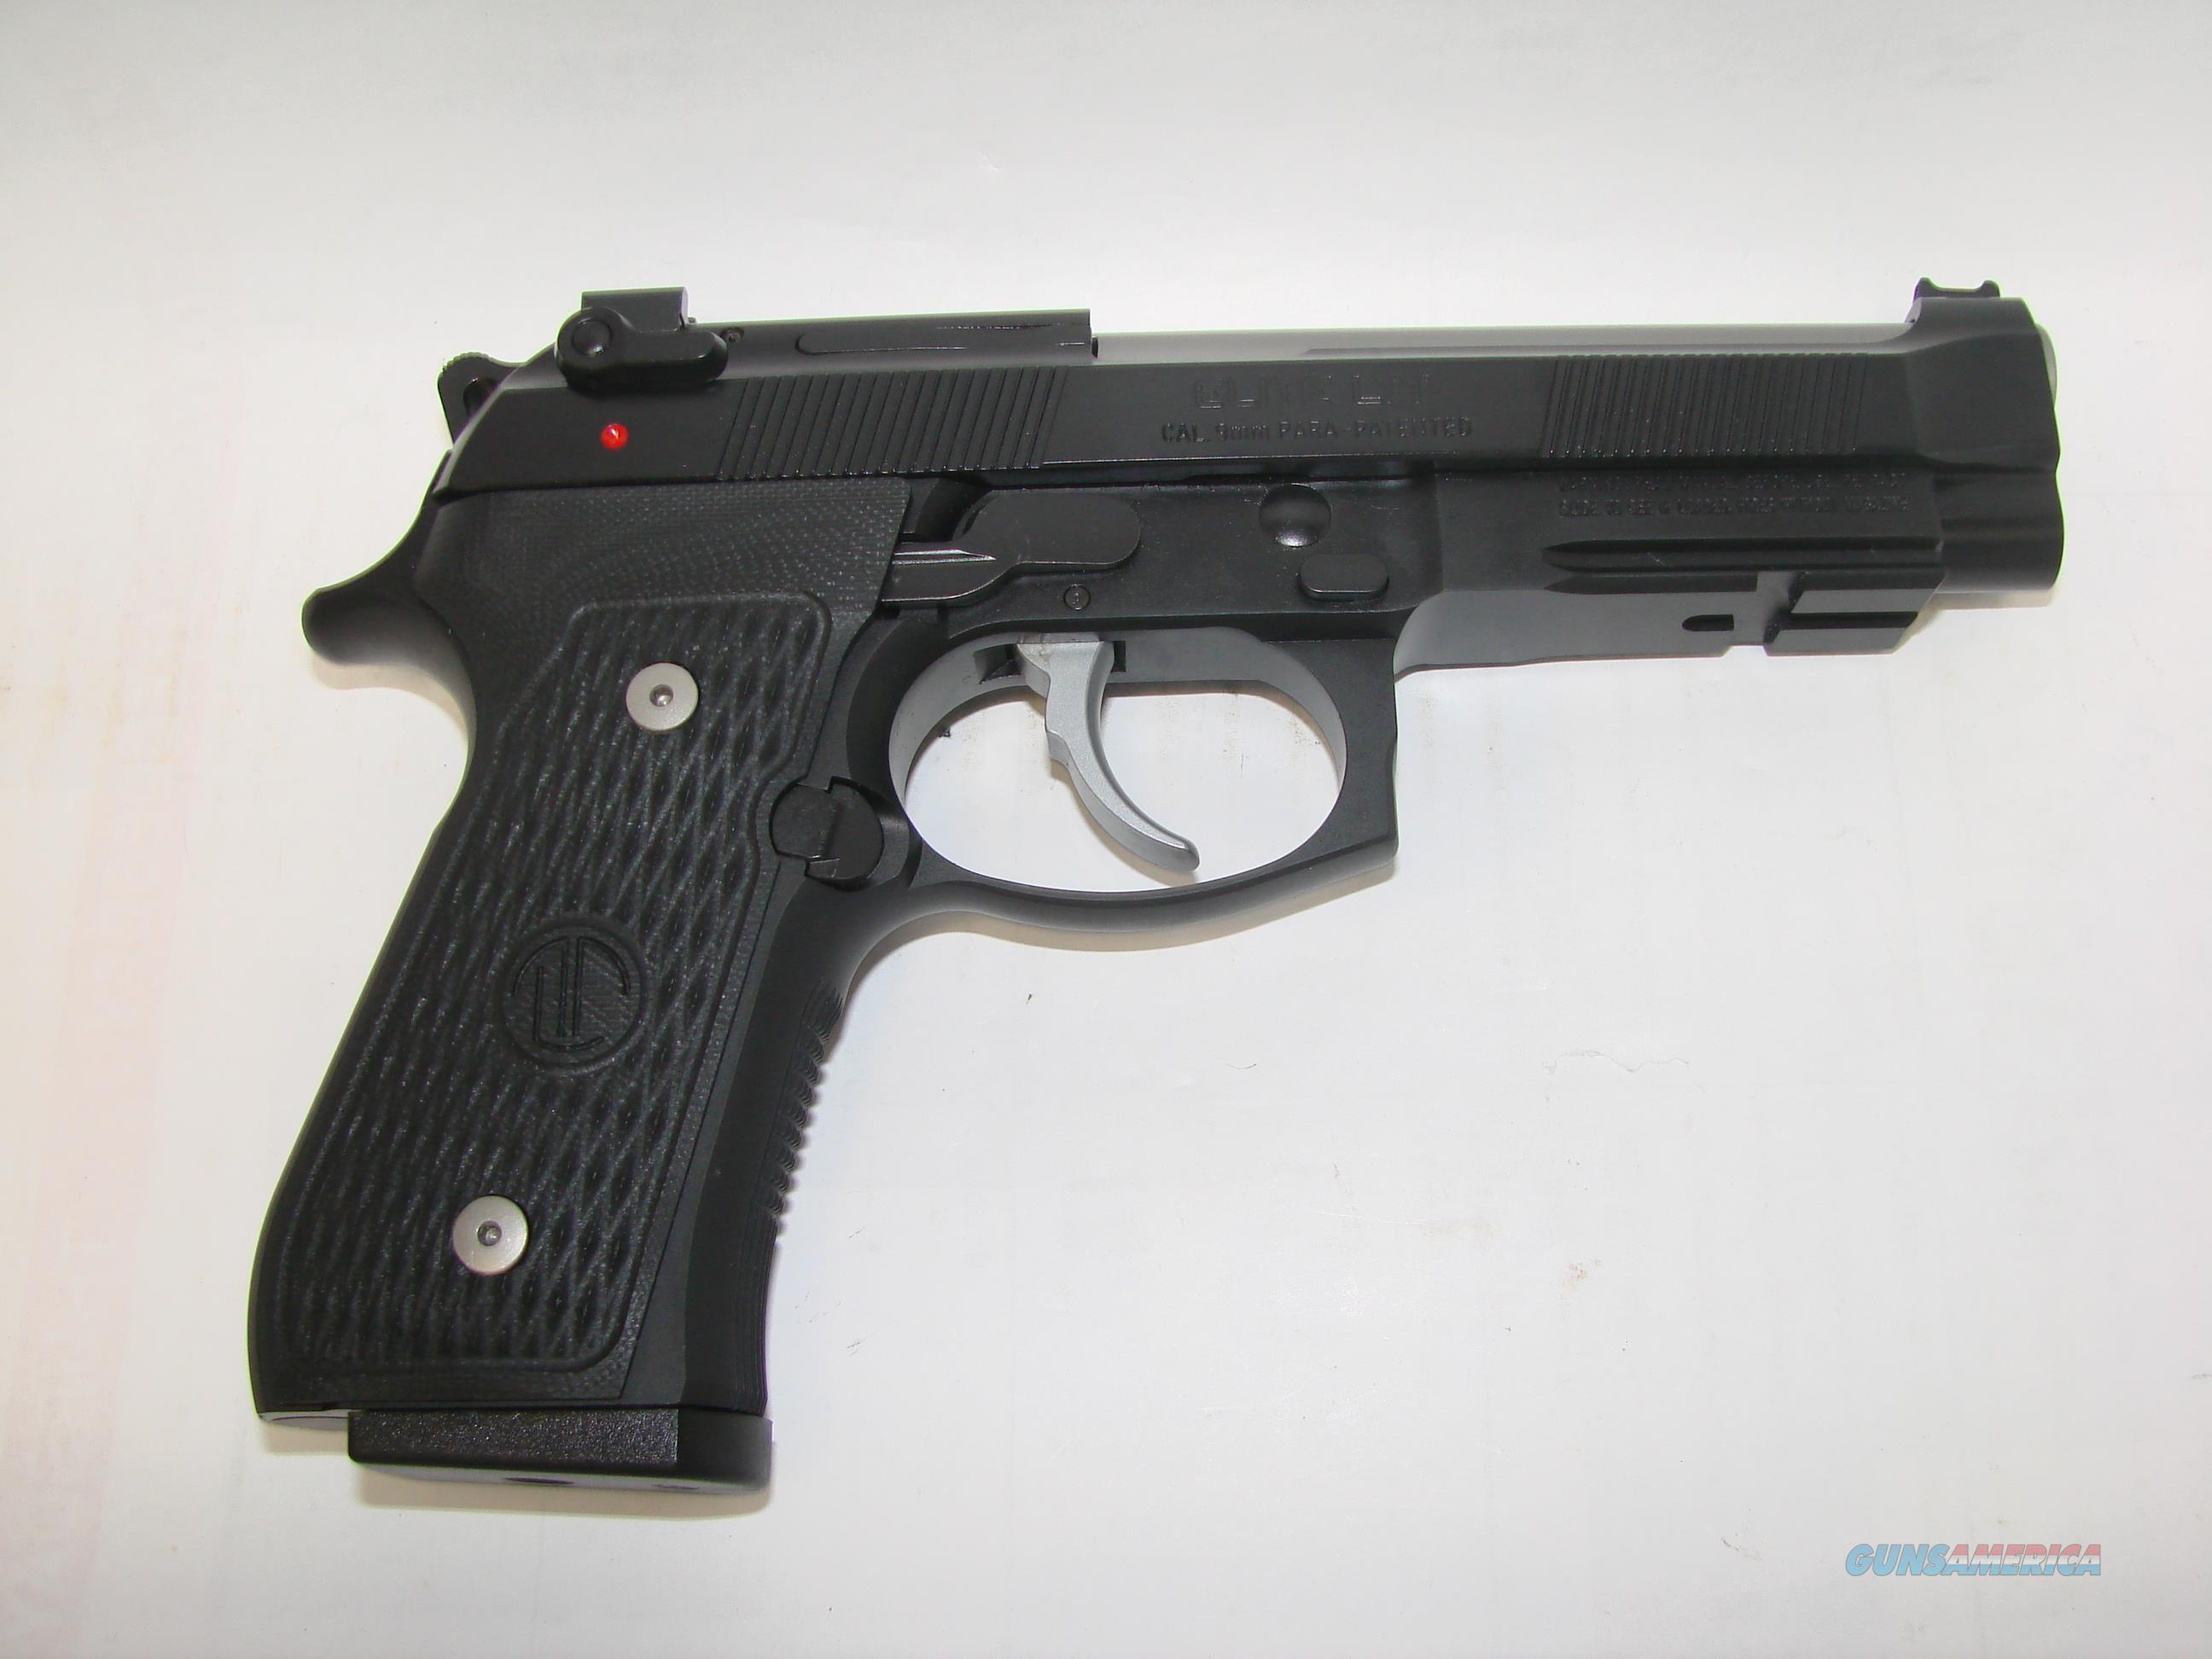 Beretta Elite LTT 9MM  Guns > Pistols > Beretta Pistols > Model 92 Series